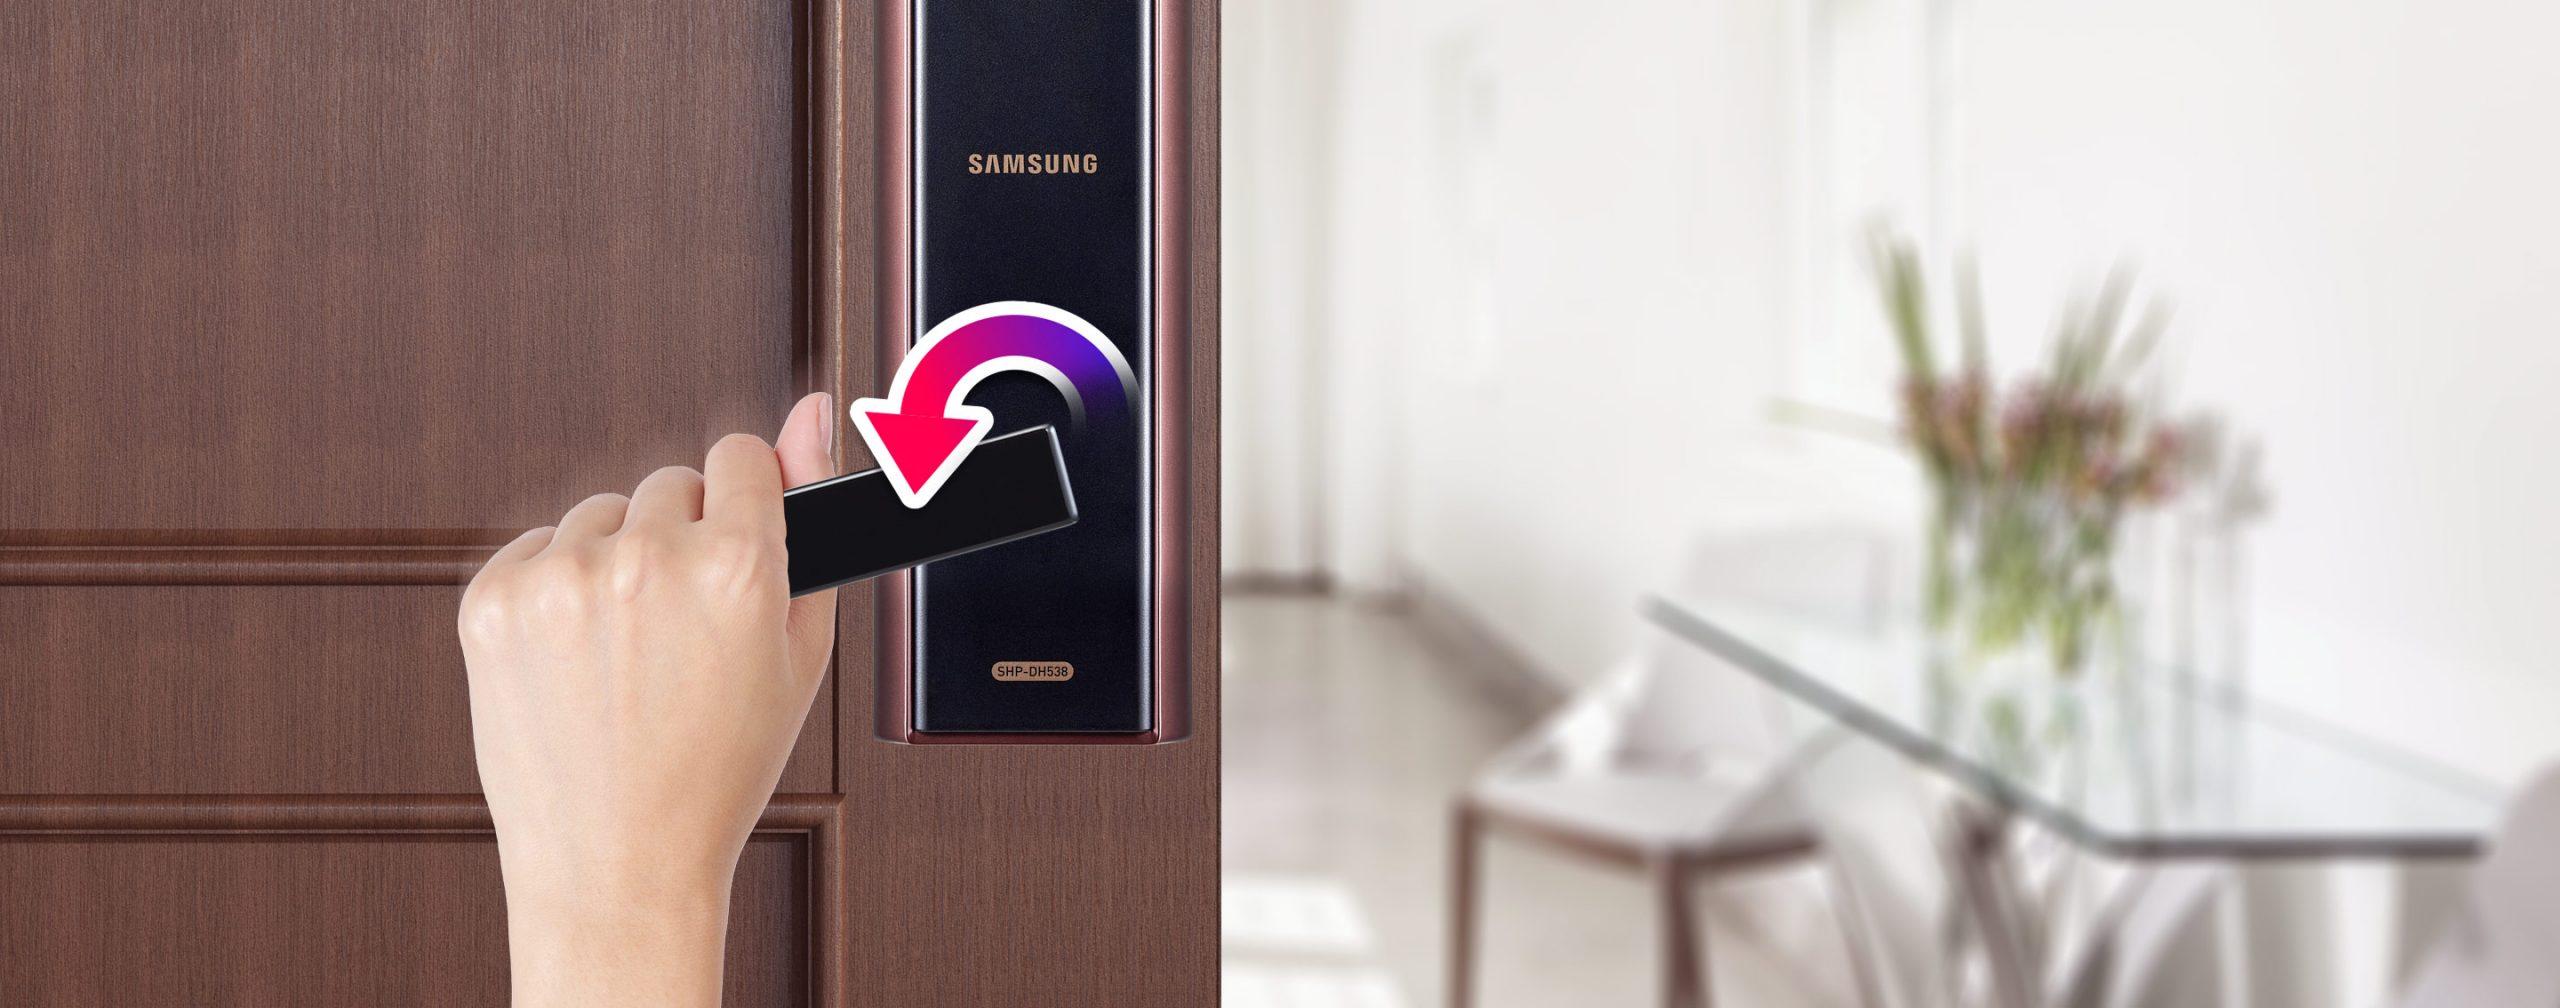 Khoá cửa điện tử Samsung SHP-DH538